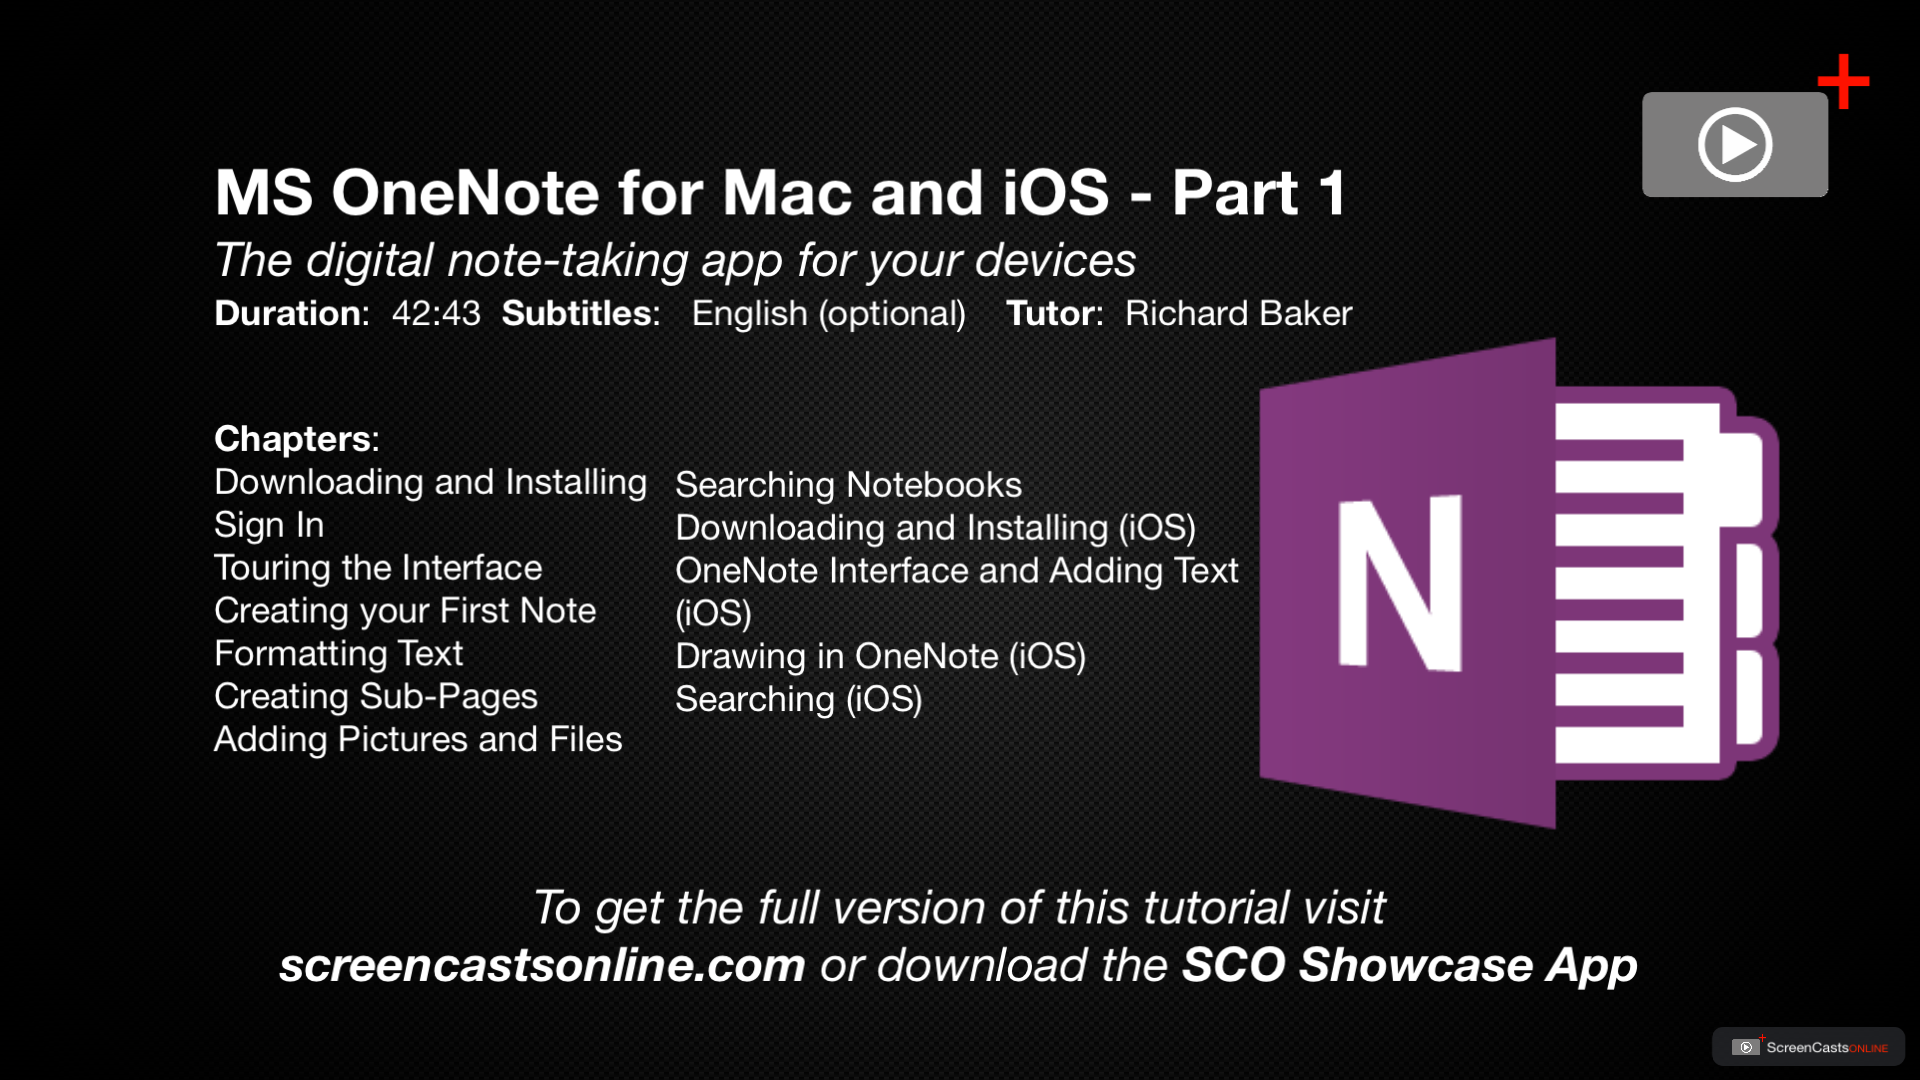 onenote on mac 2018